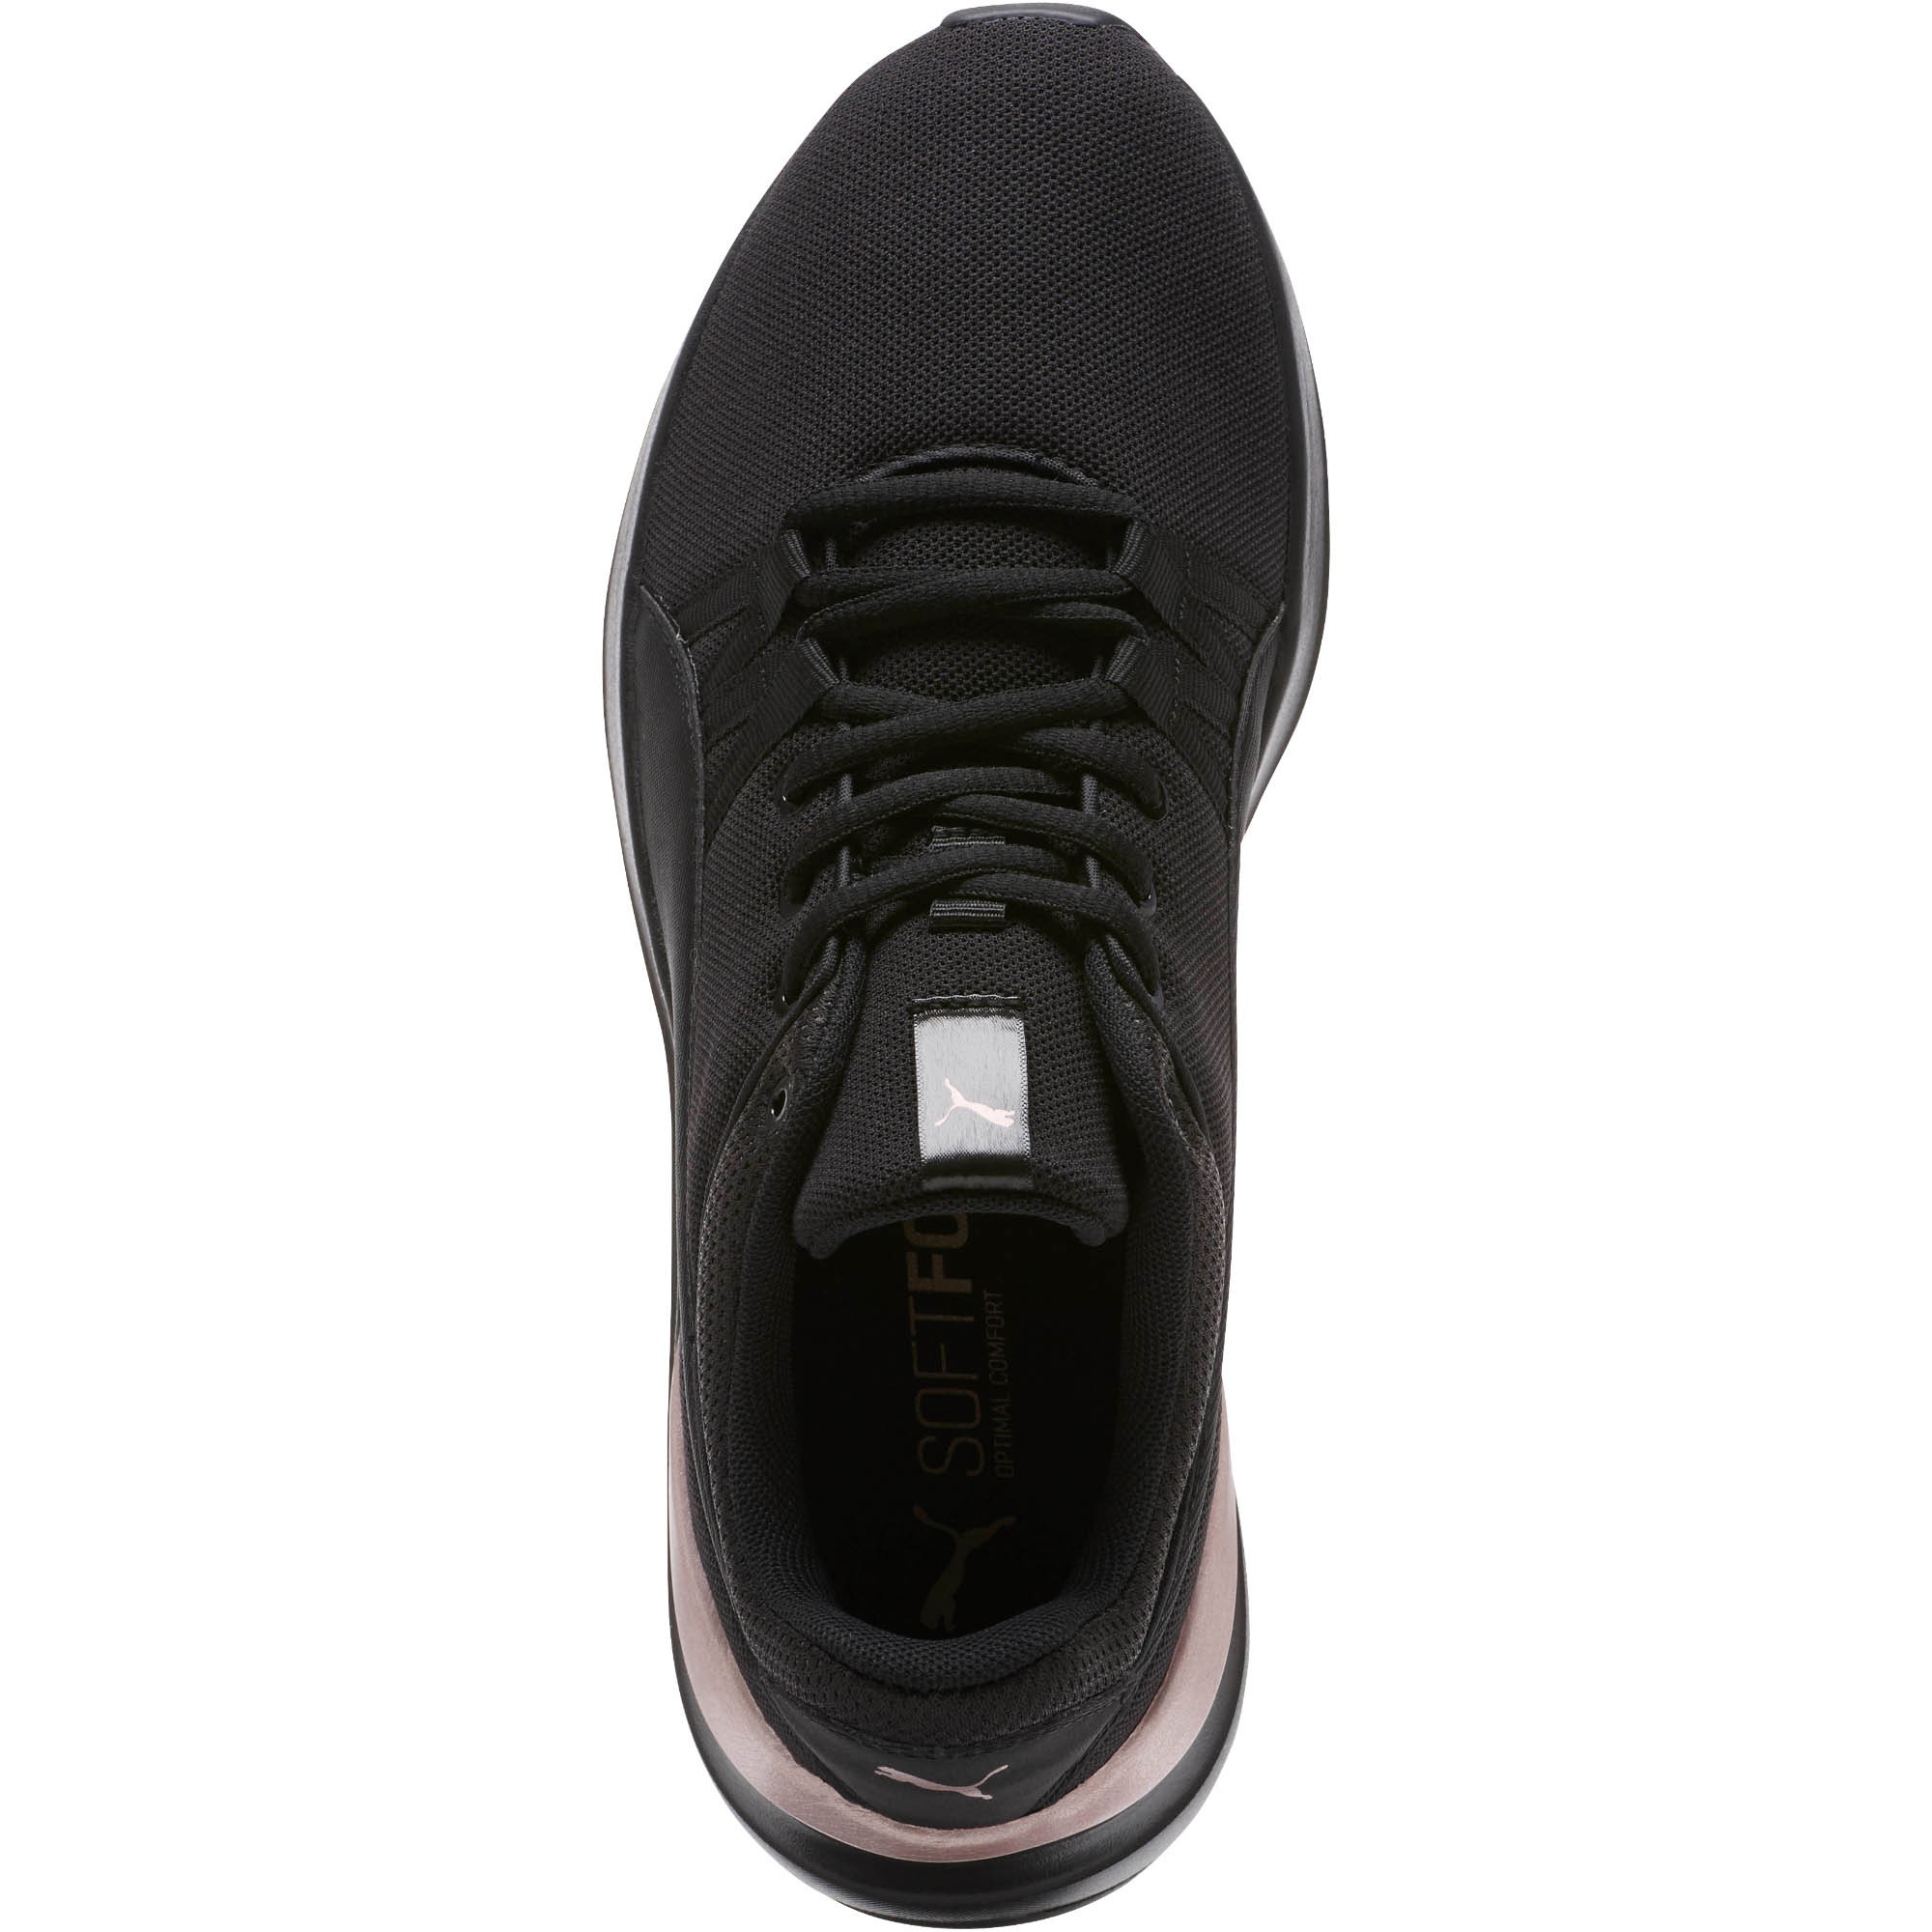 PUMA-Adela-Mesh-Women-s-Sneakers-Women-Shoe-Basics thumbnail 11